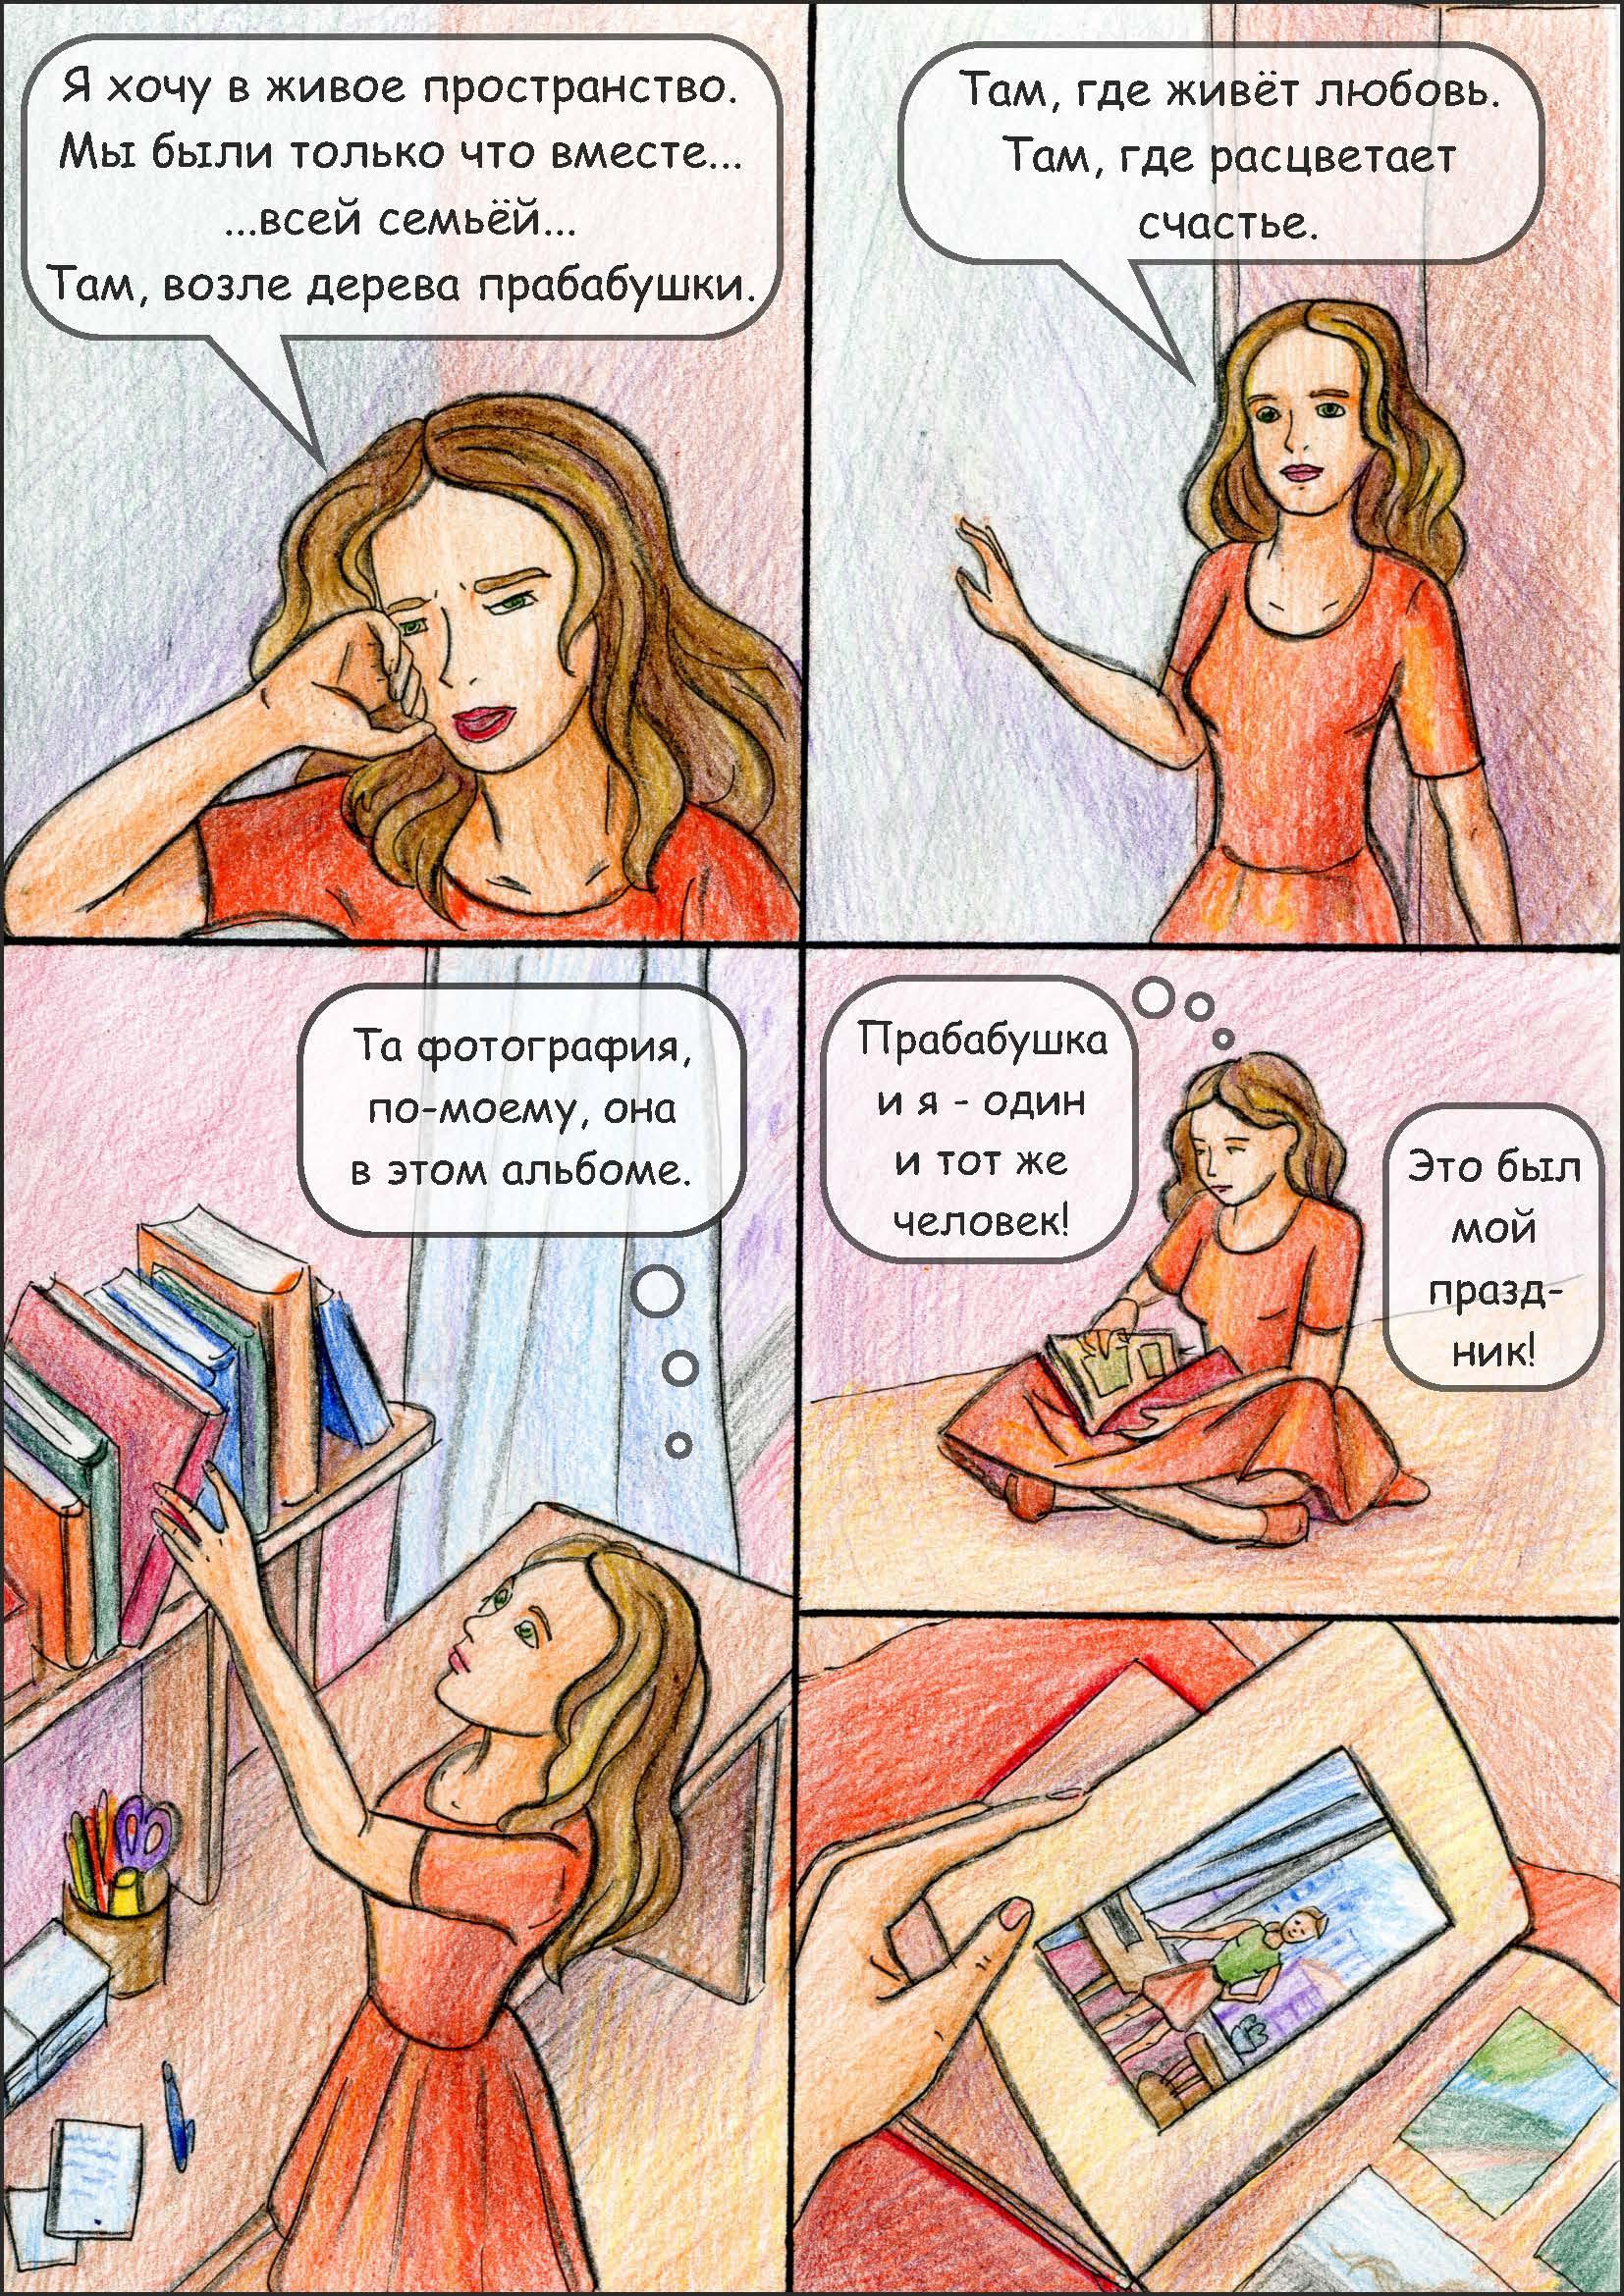 Анна Гейдебрехт. Комикс Зовущая мечта (24).jpg